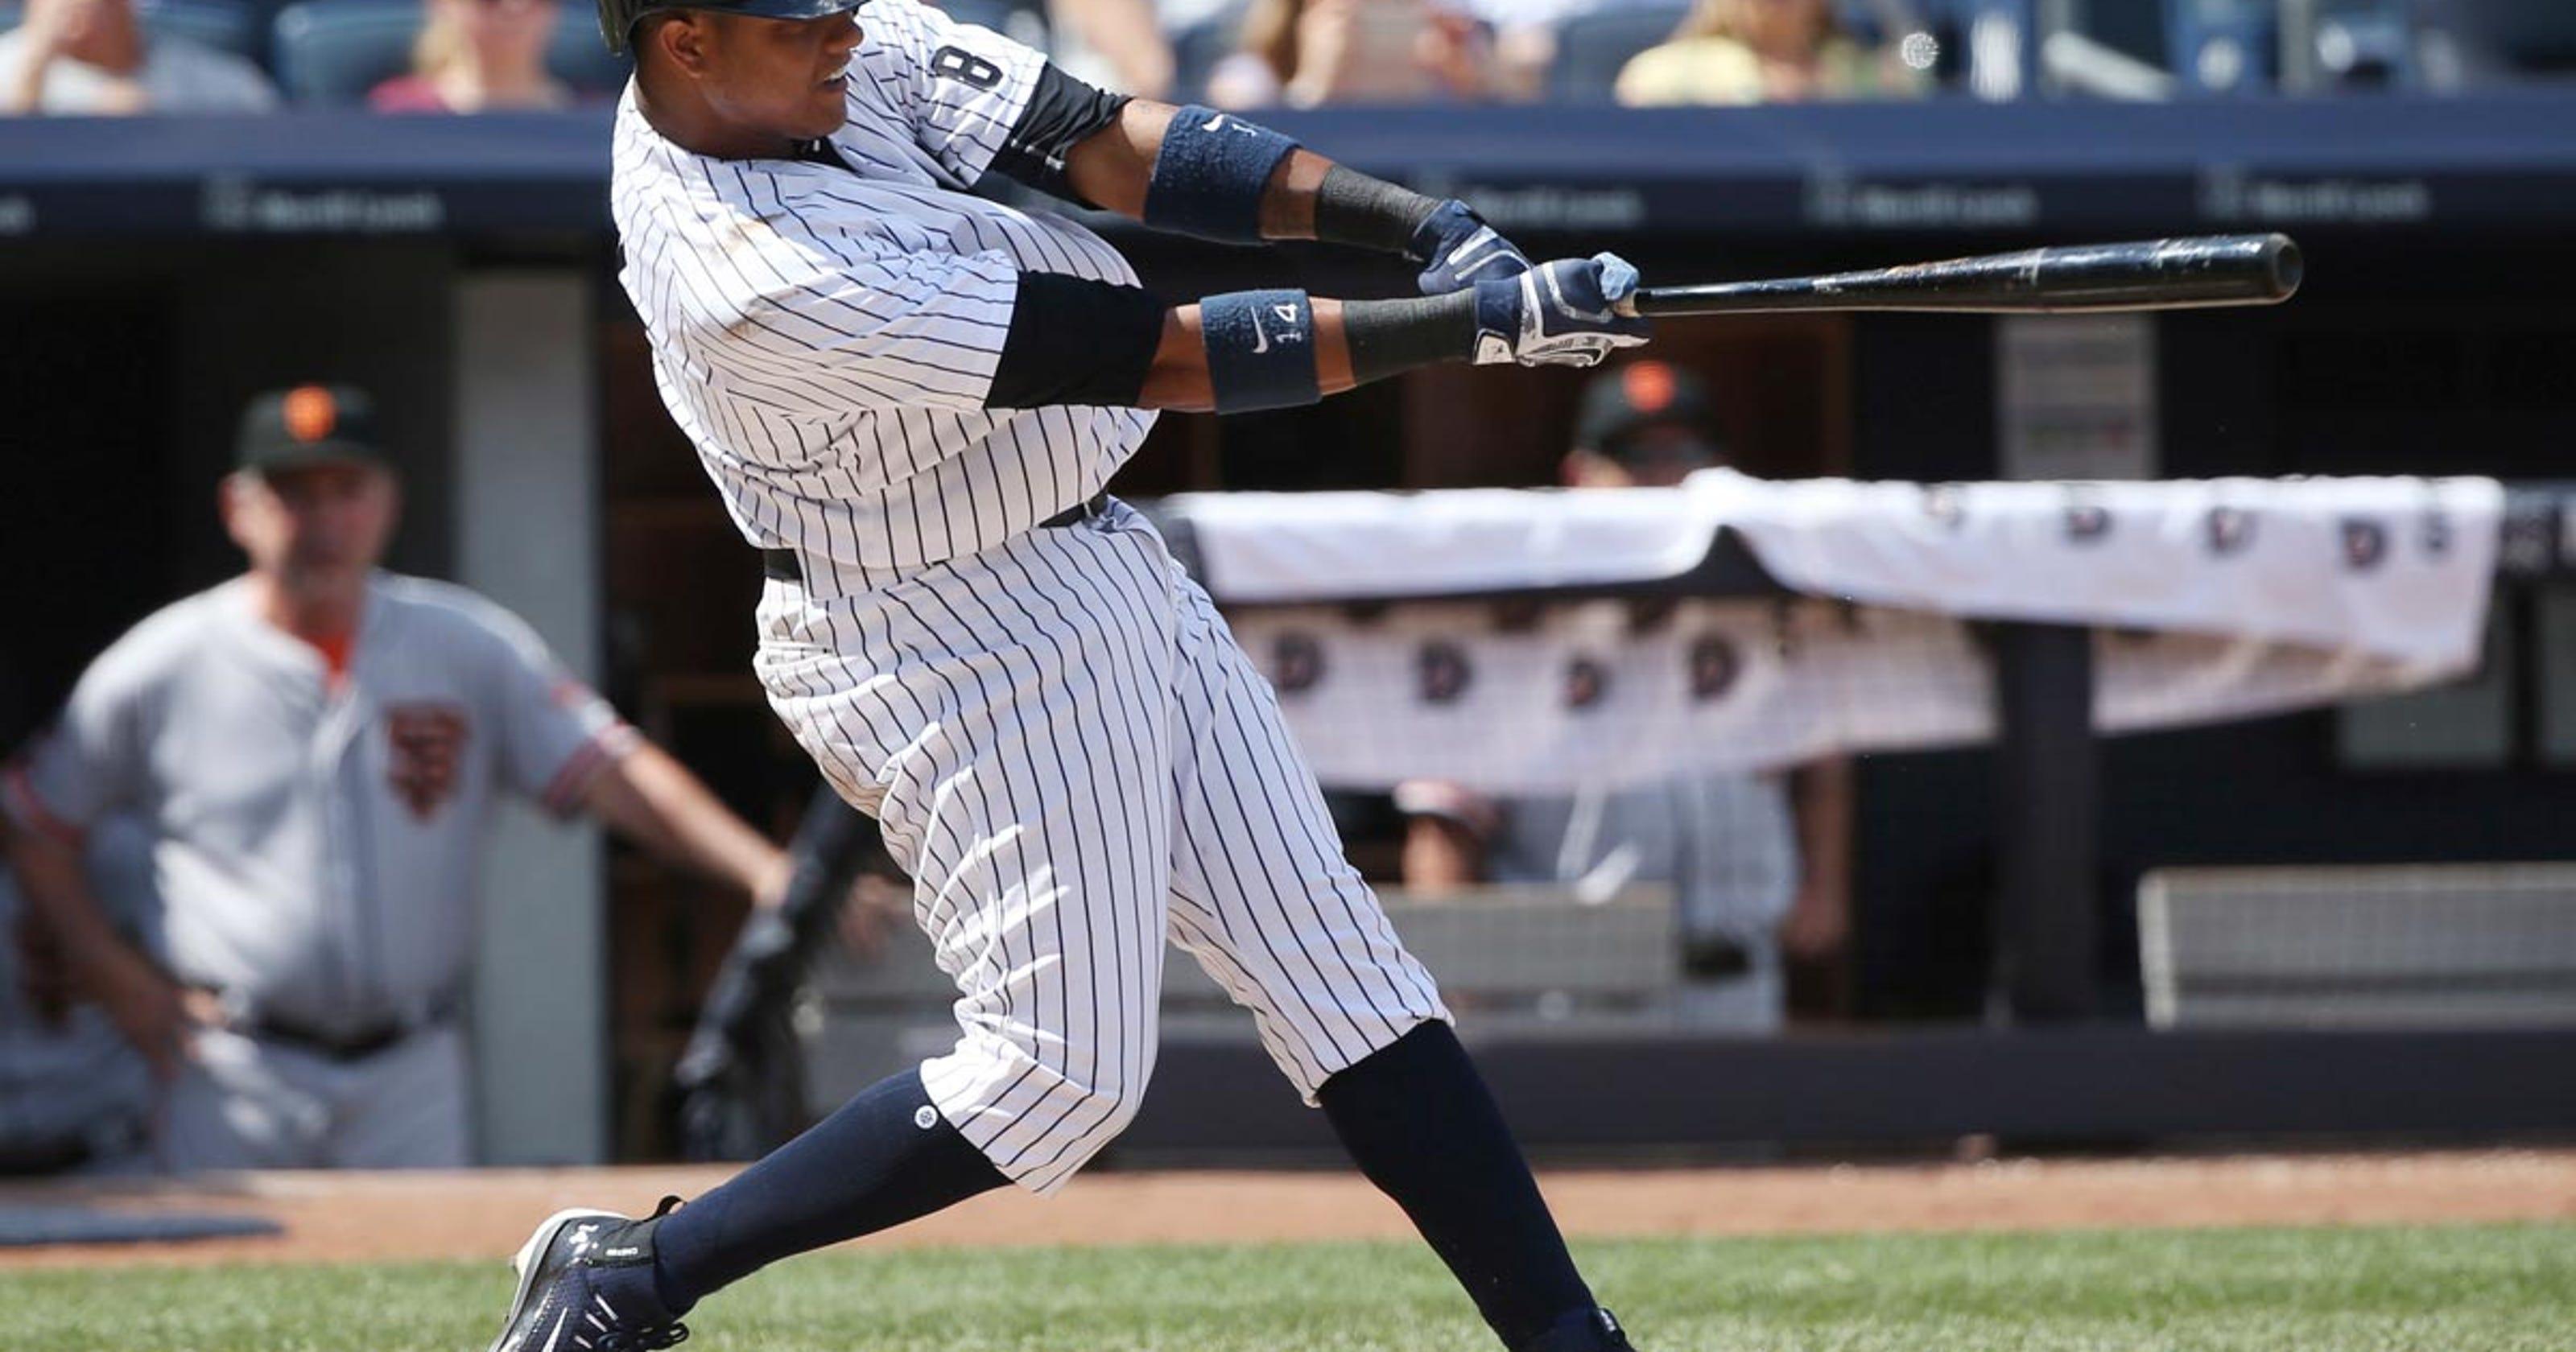 reputable site 44ae7 139cf Yankees beat Giants, 5-2